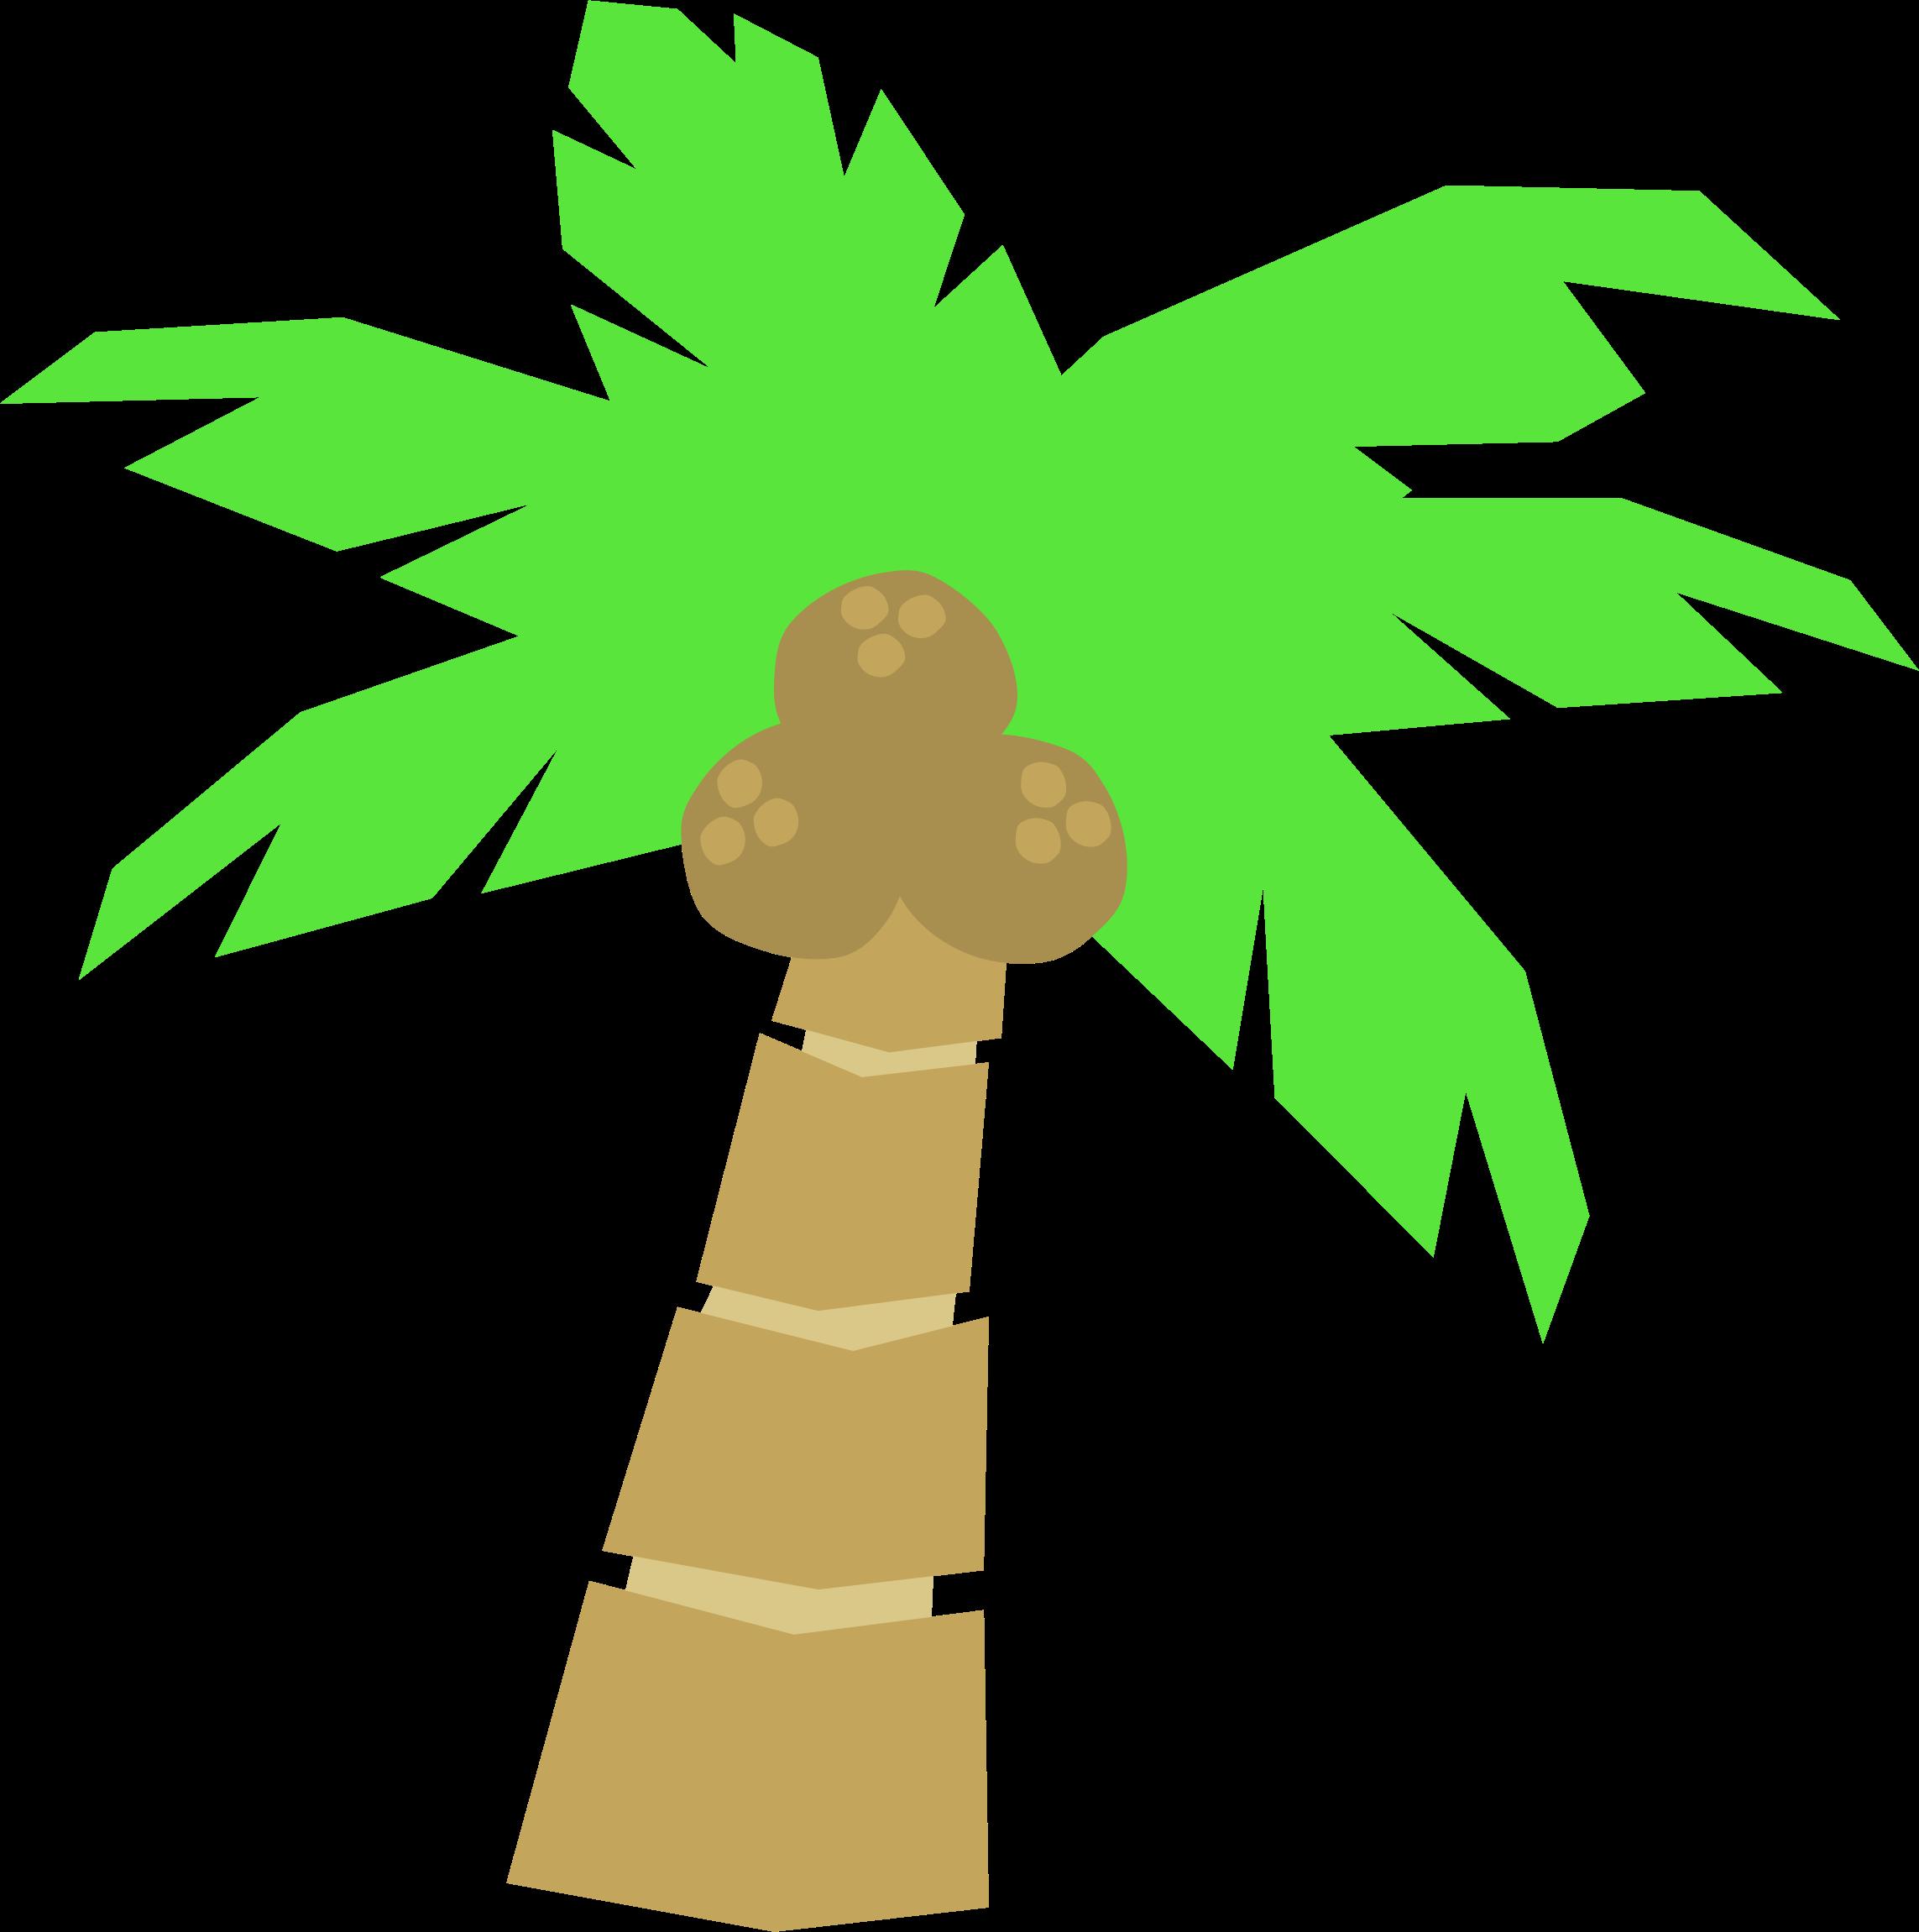 Palm tree art tropical palm trees clip art clip art palm tree 3 - Clipartix